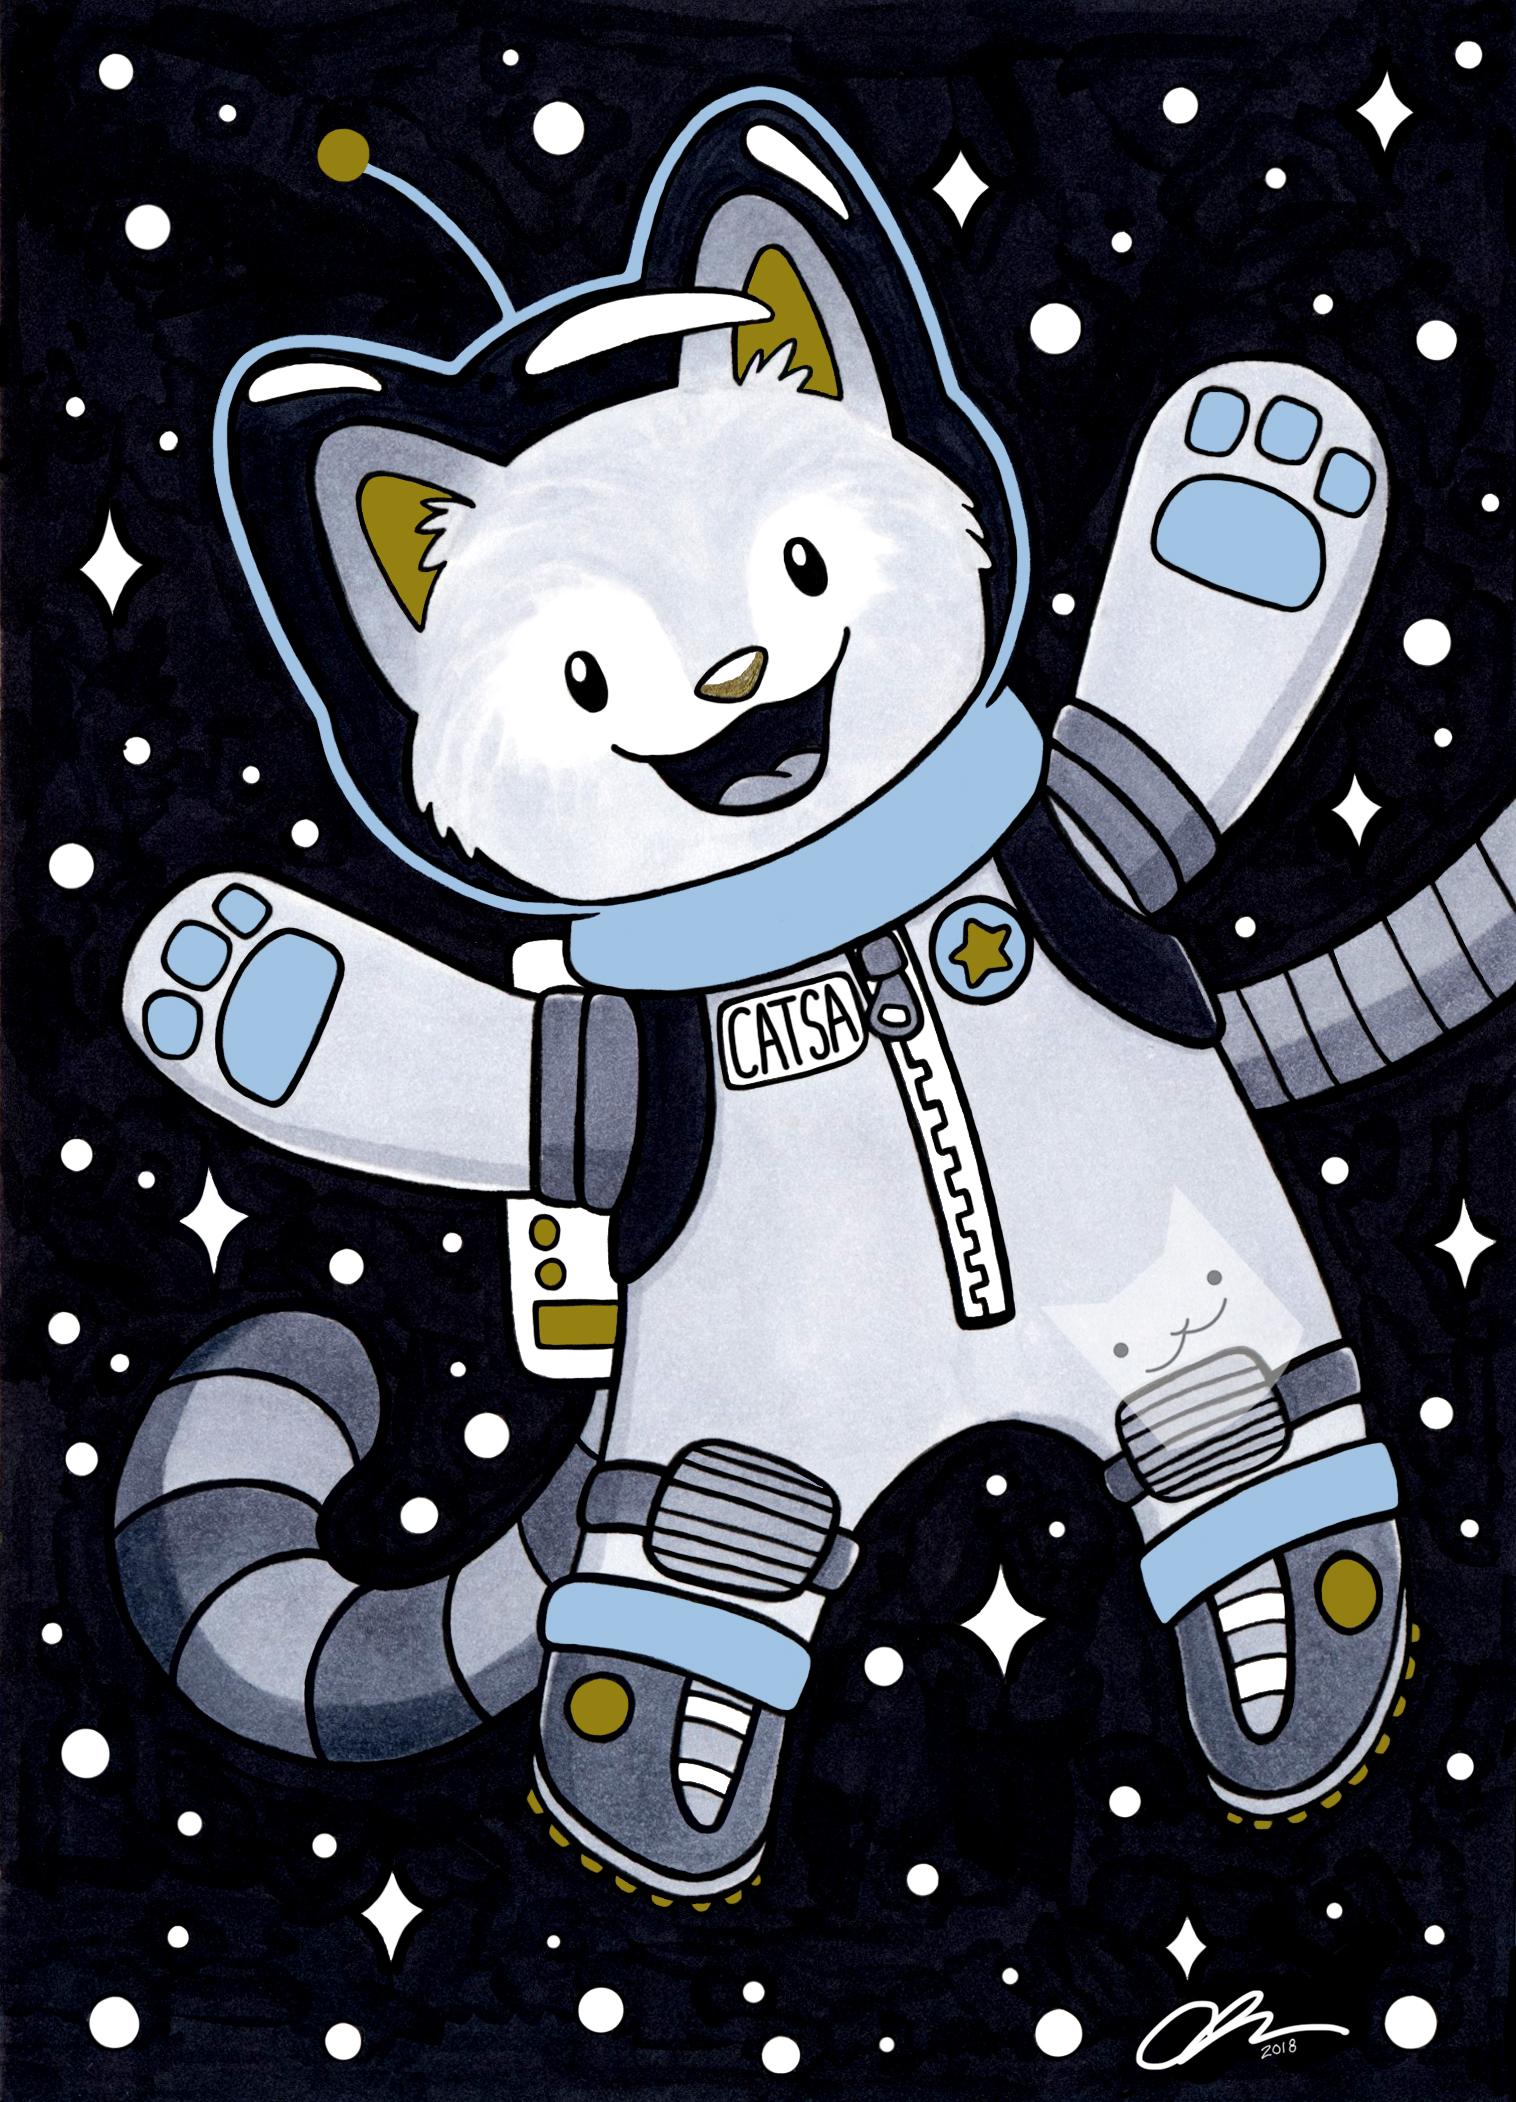 CATSA kitty.jpg